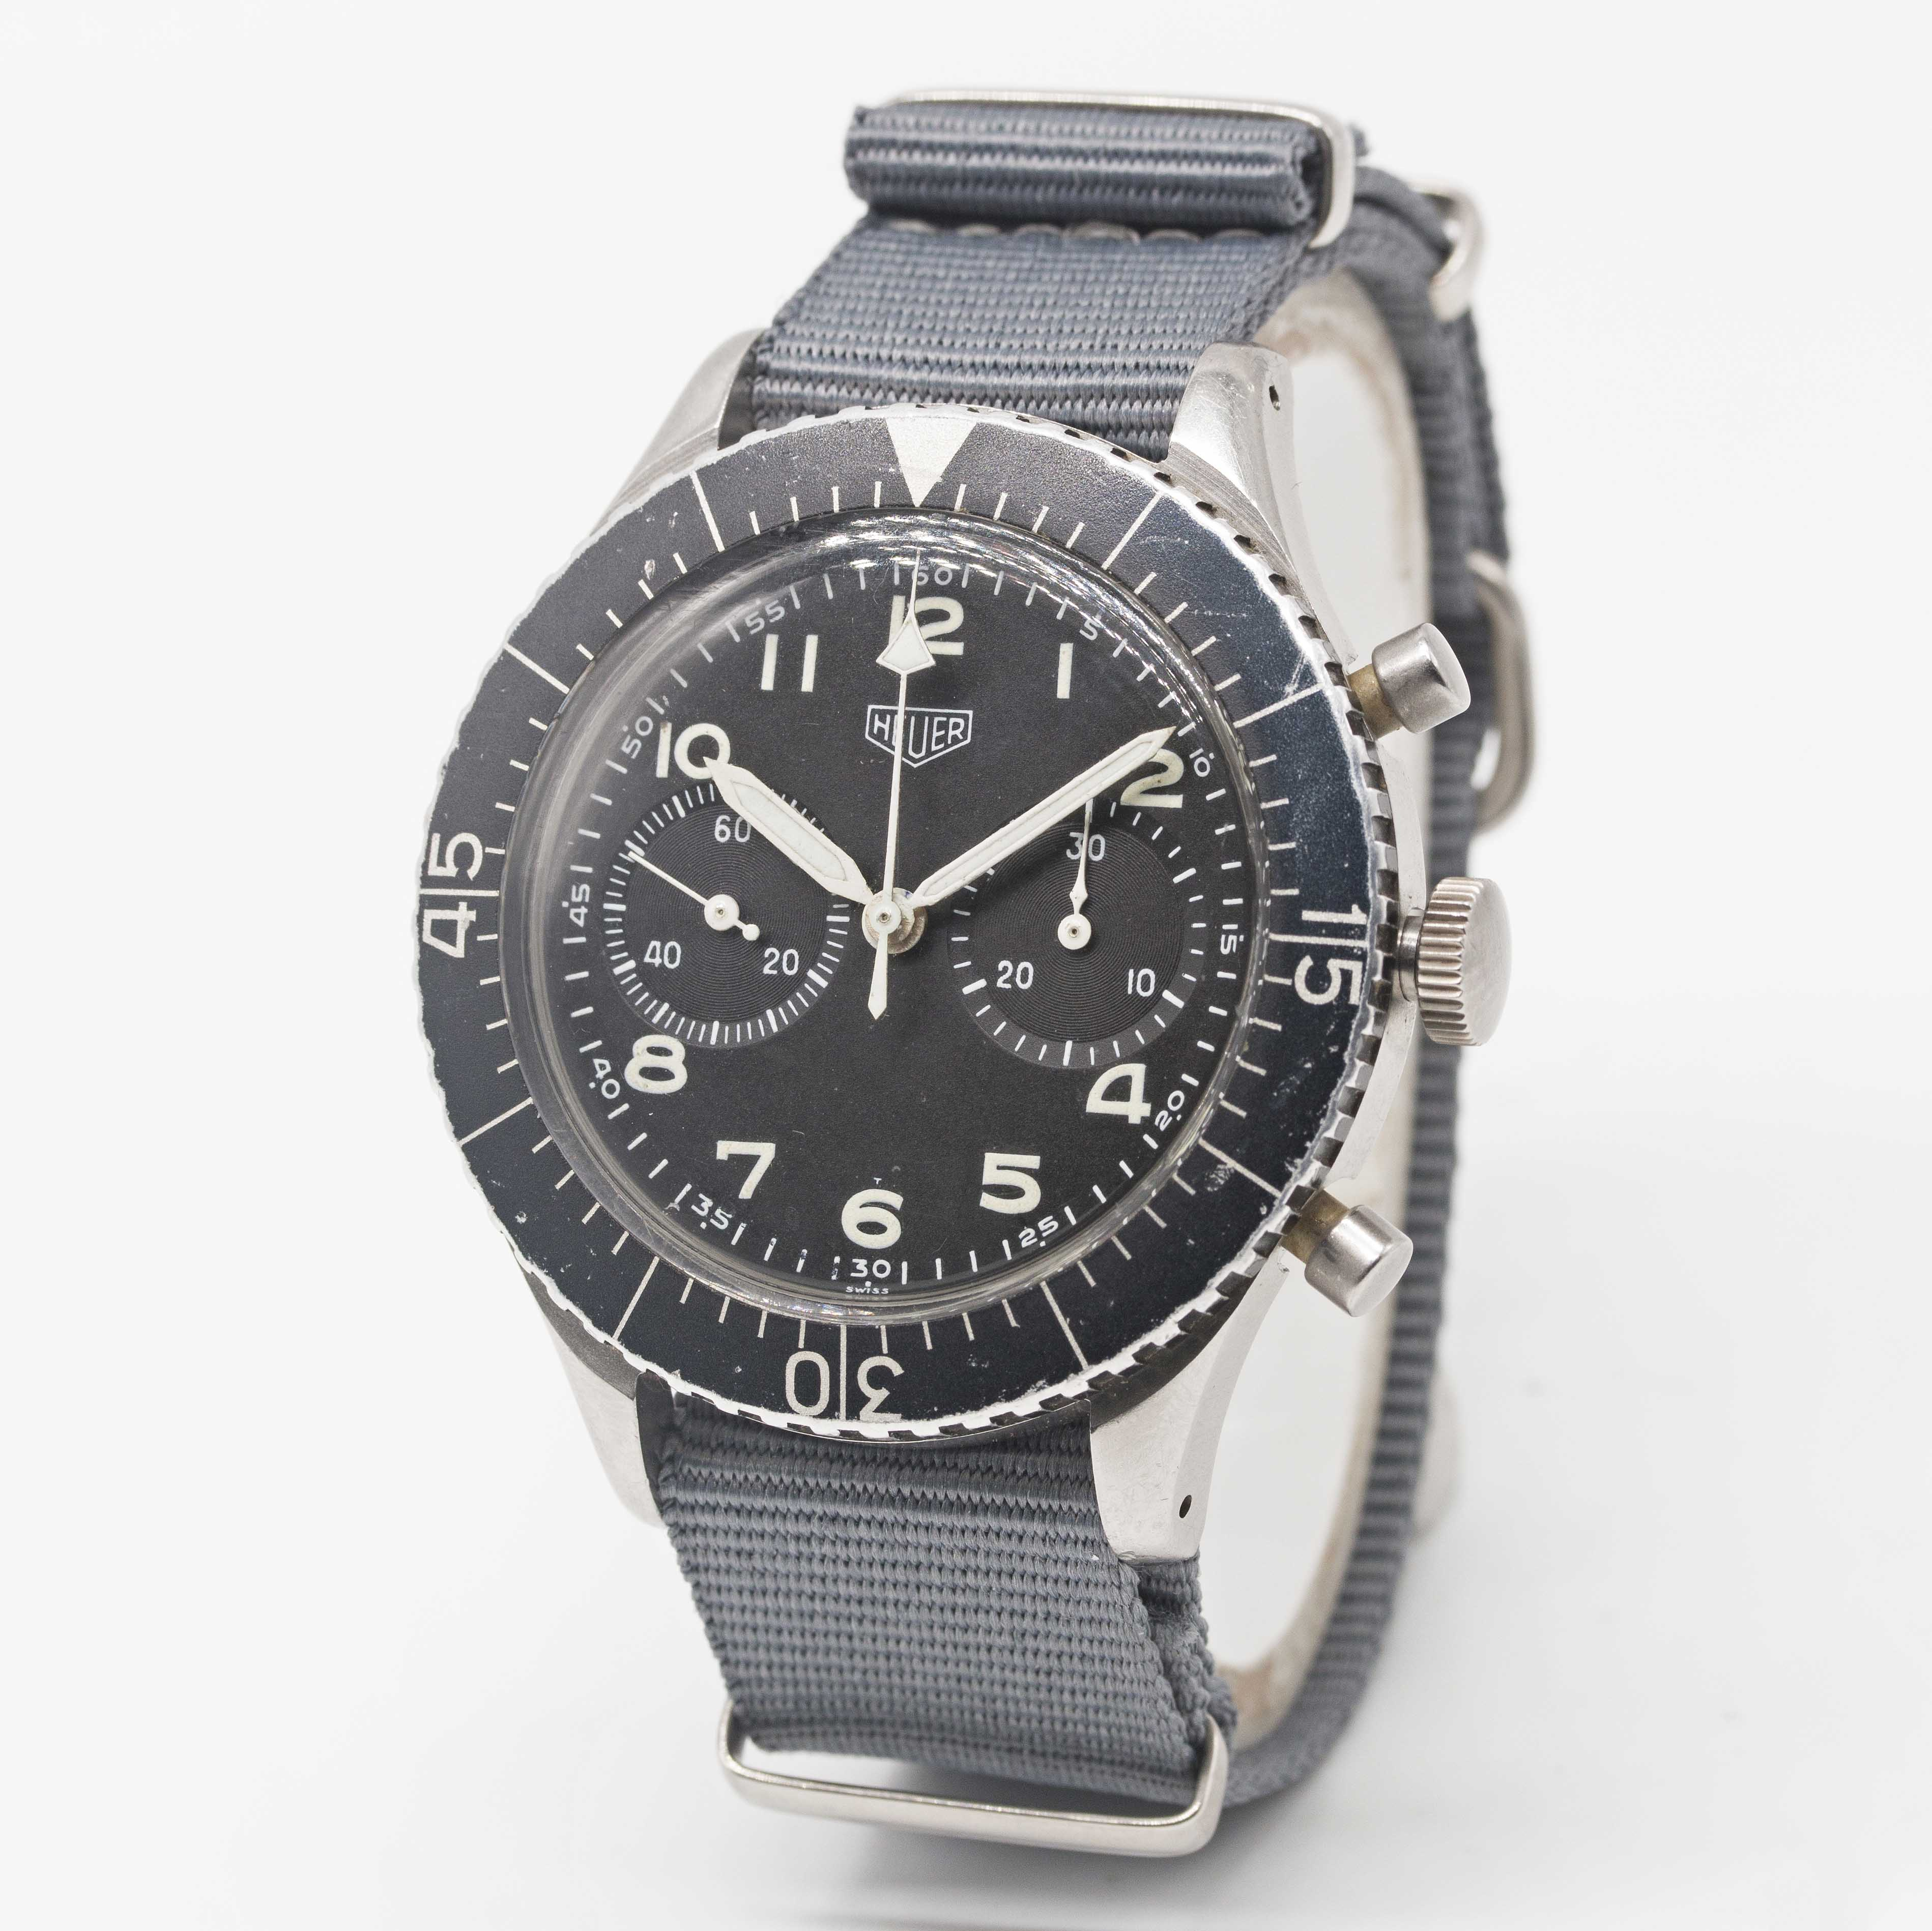 Lot 1 - A GENTLEMAN'S STAINLESS STEEL GERMAN MILITARY HEUER BUND FLYBACK CHRONOGRAPH WRIST WATCH CIRCA 1970,